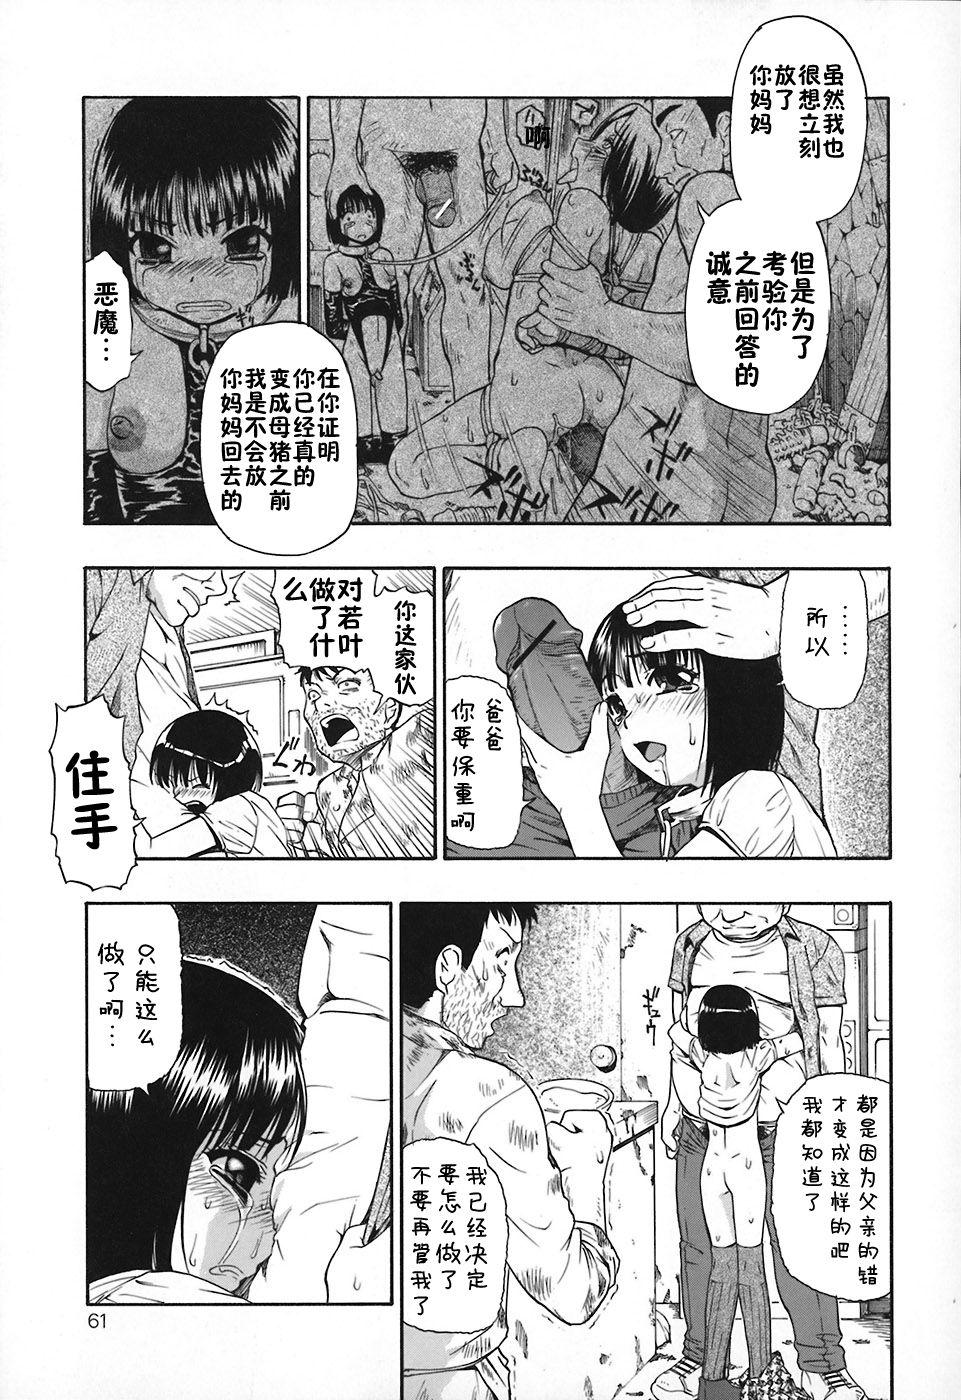 Akutoku no Sakae - Prosperites du Vice 62